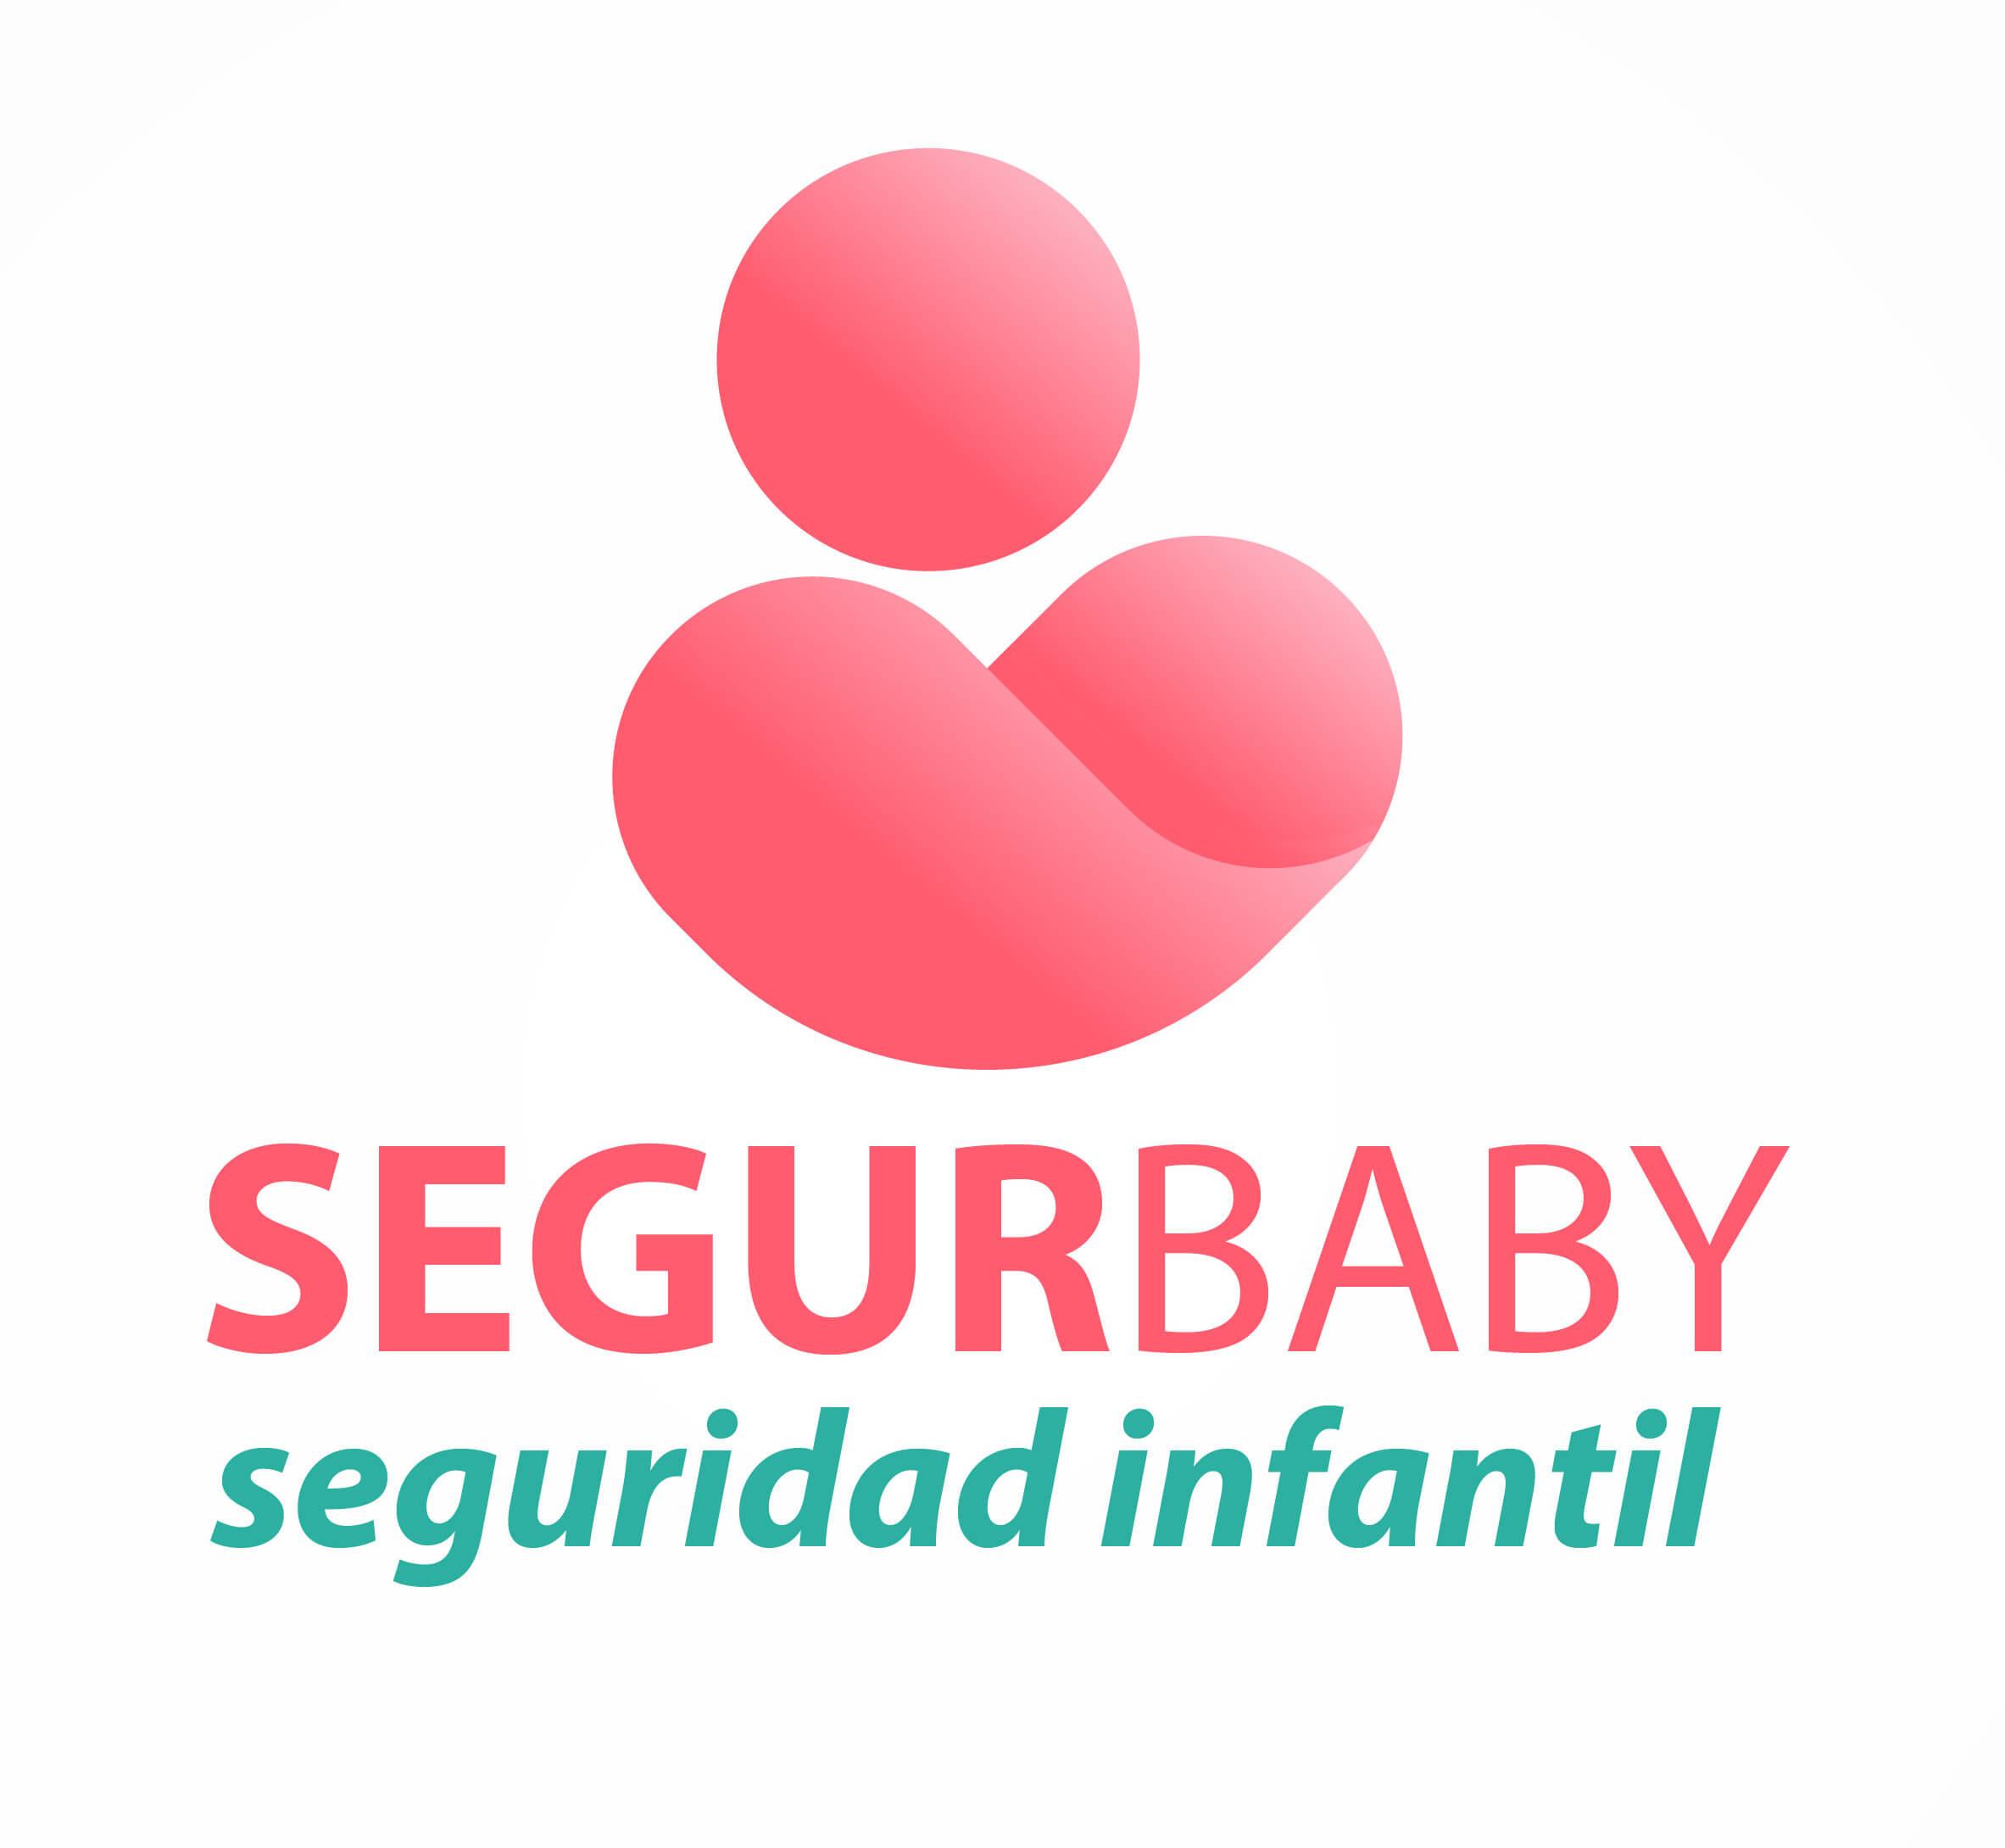 Segurbaby